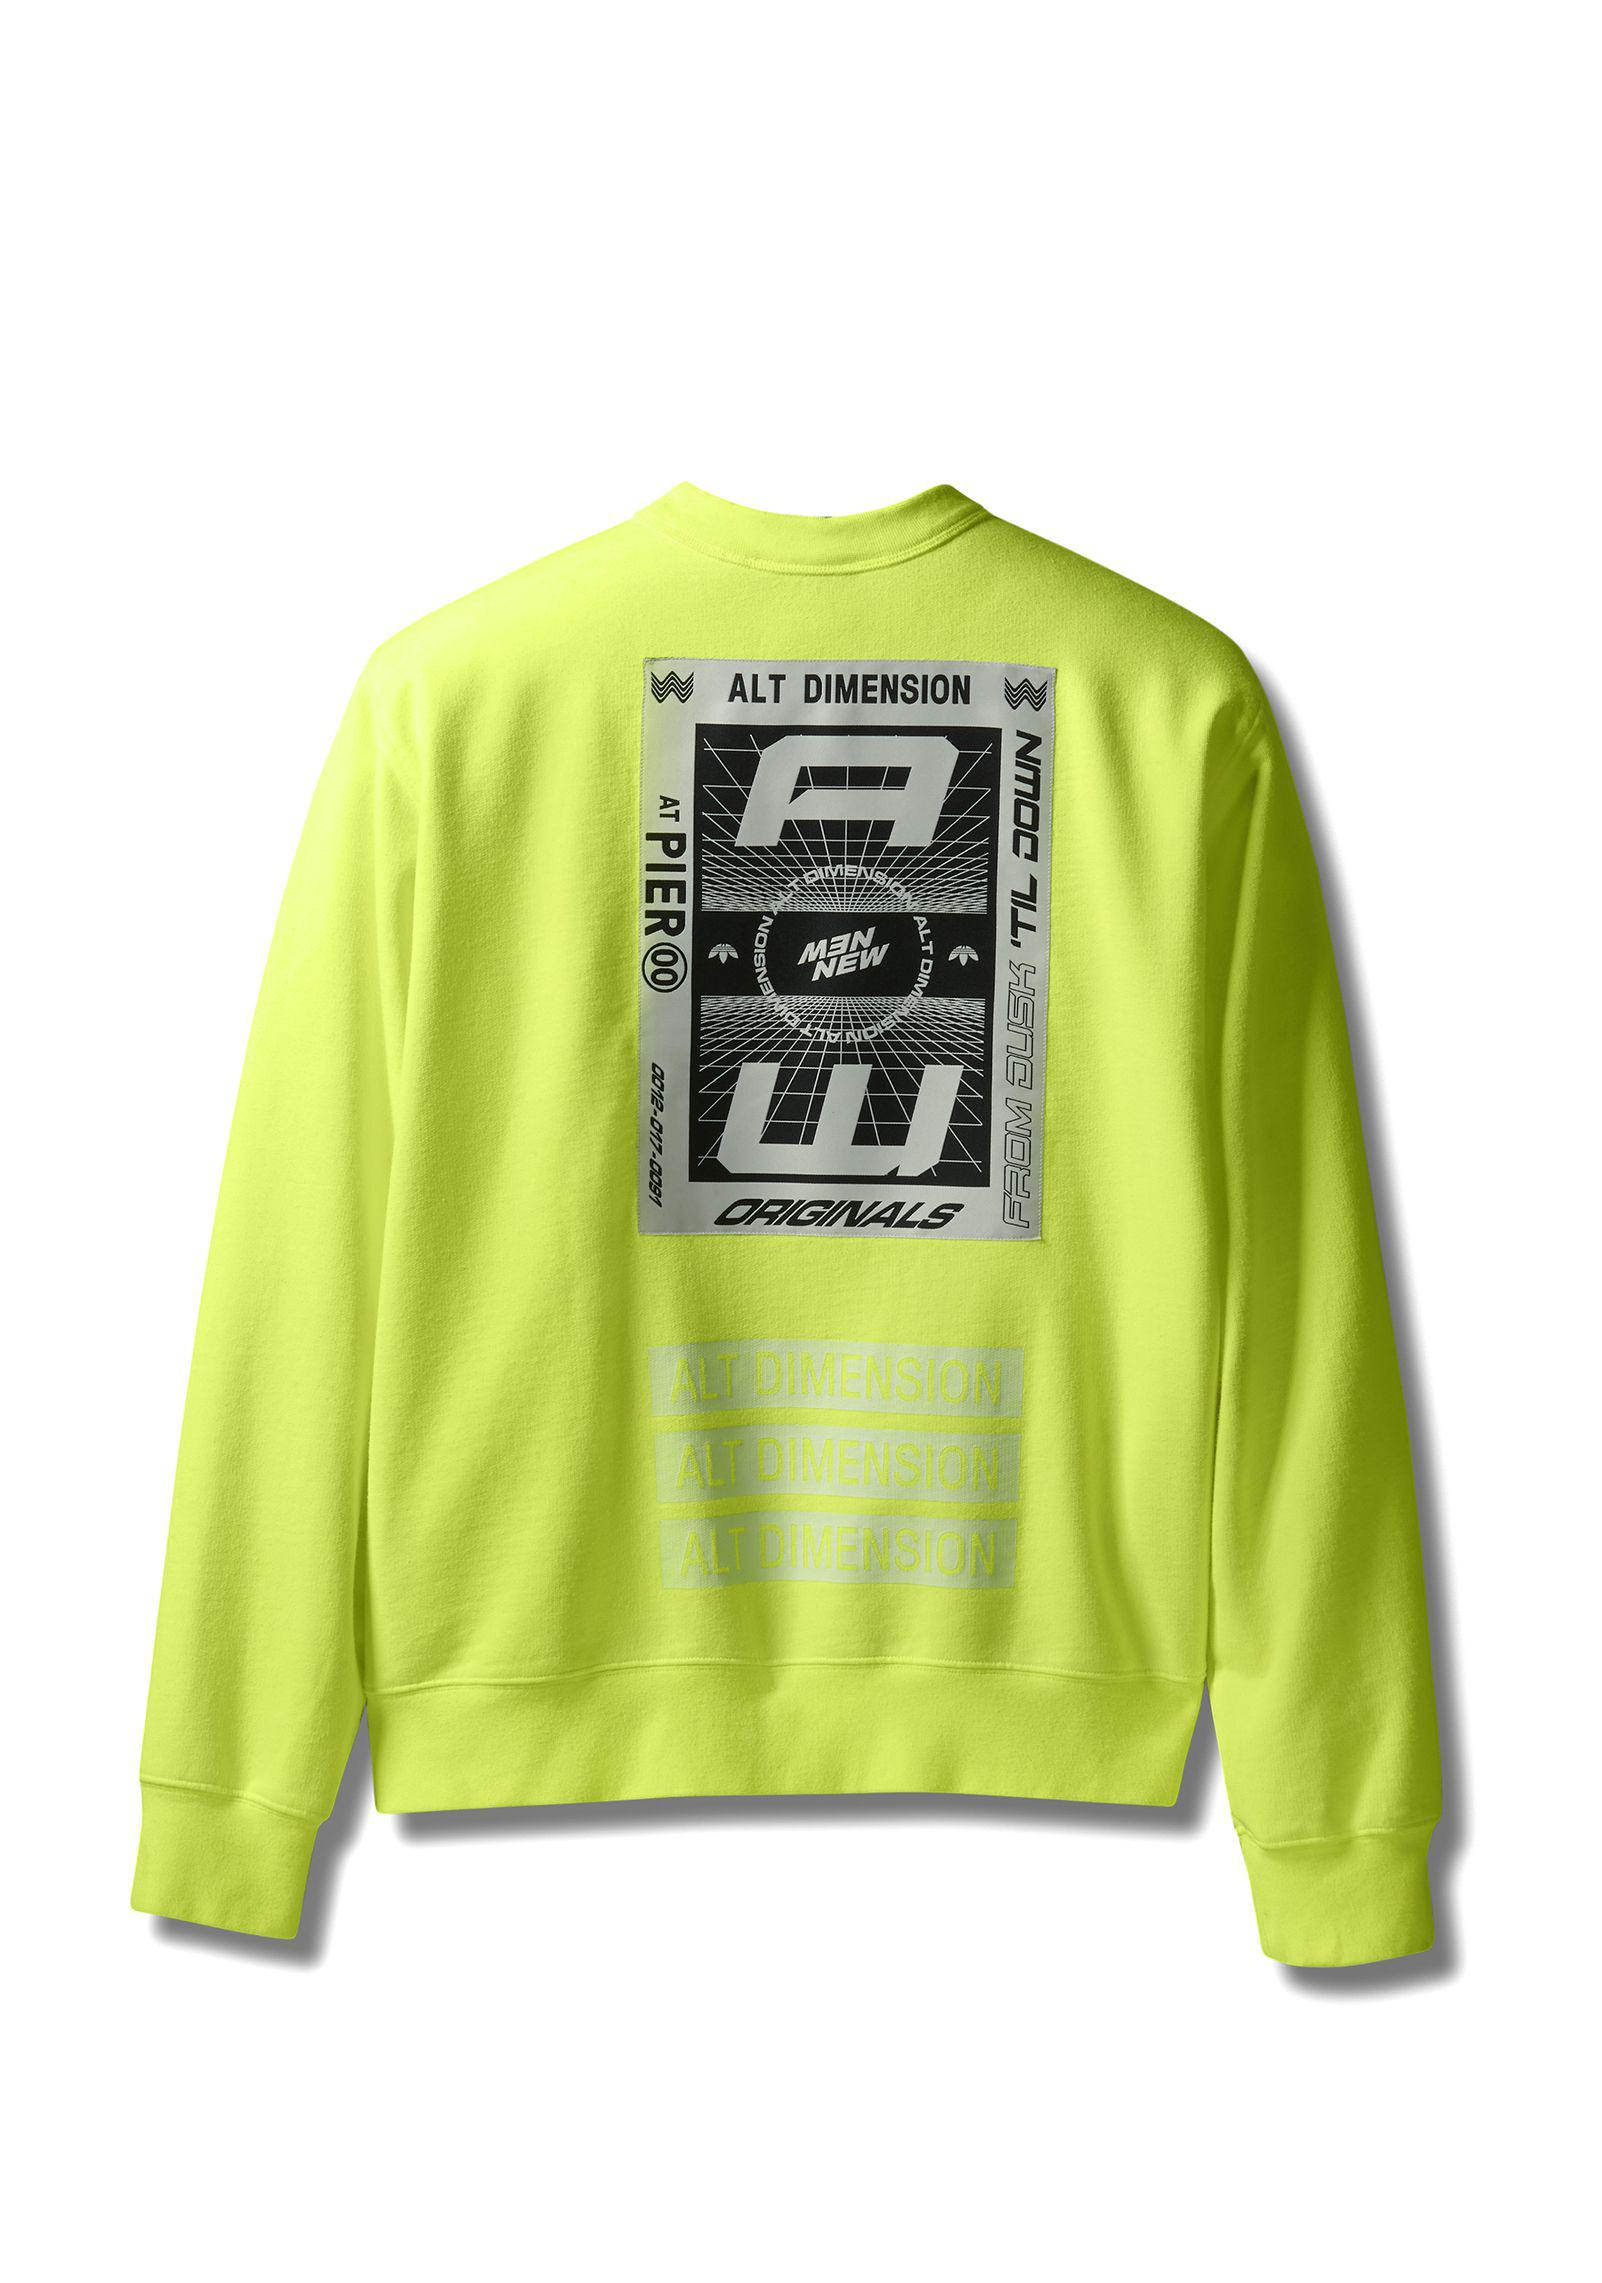 99bea922cd7 Alexander Wang Adidas Originals By Aw Bleach Crewneck in Yellow for ...